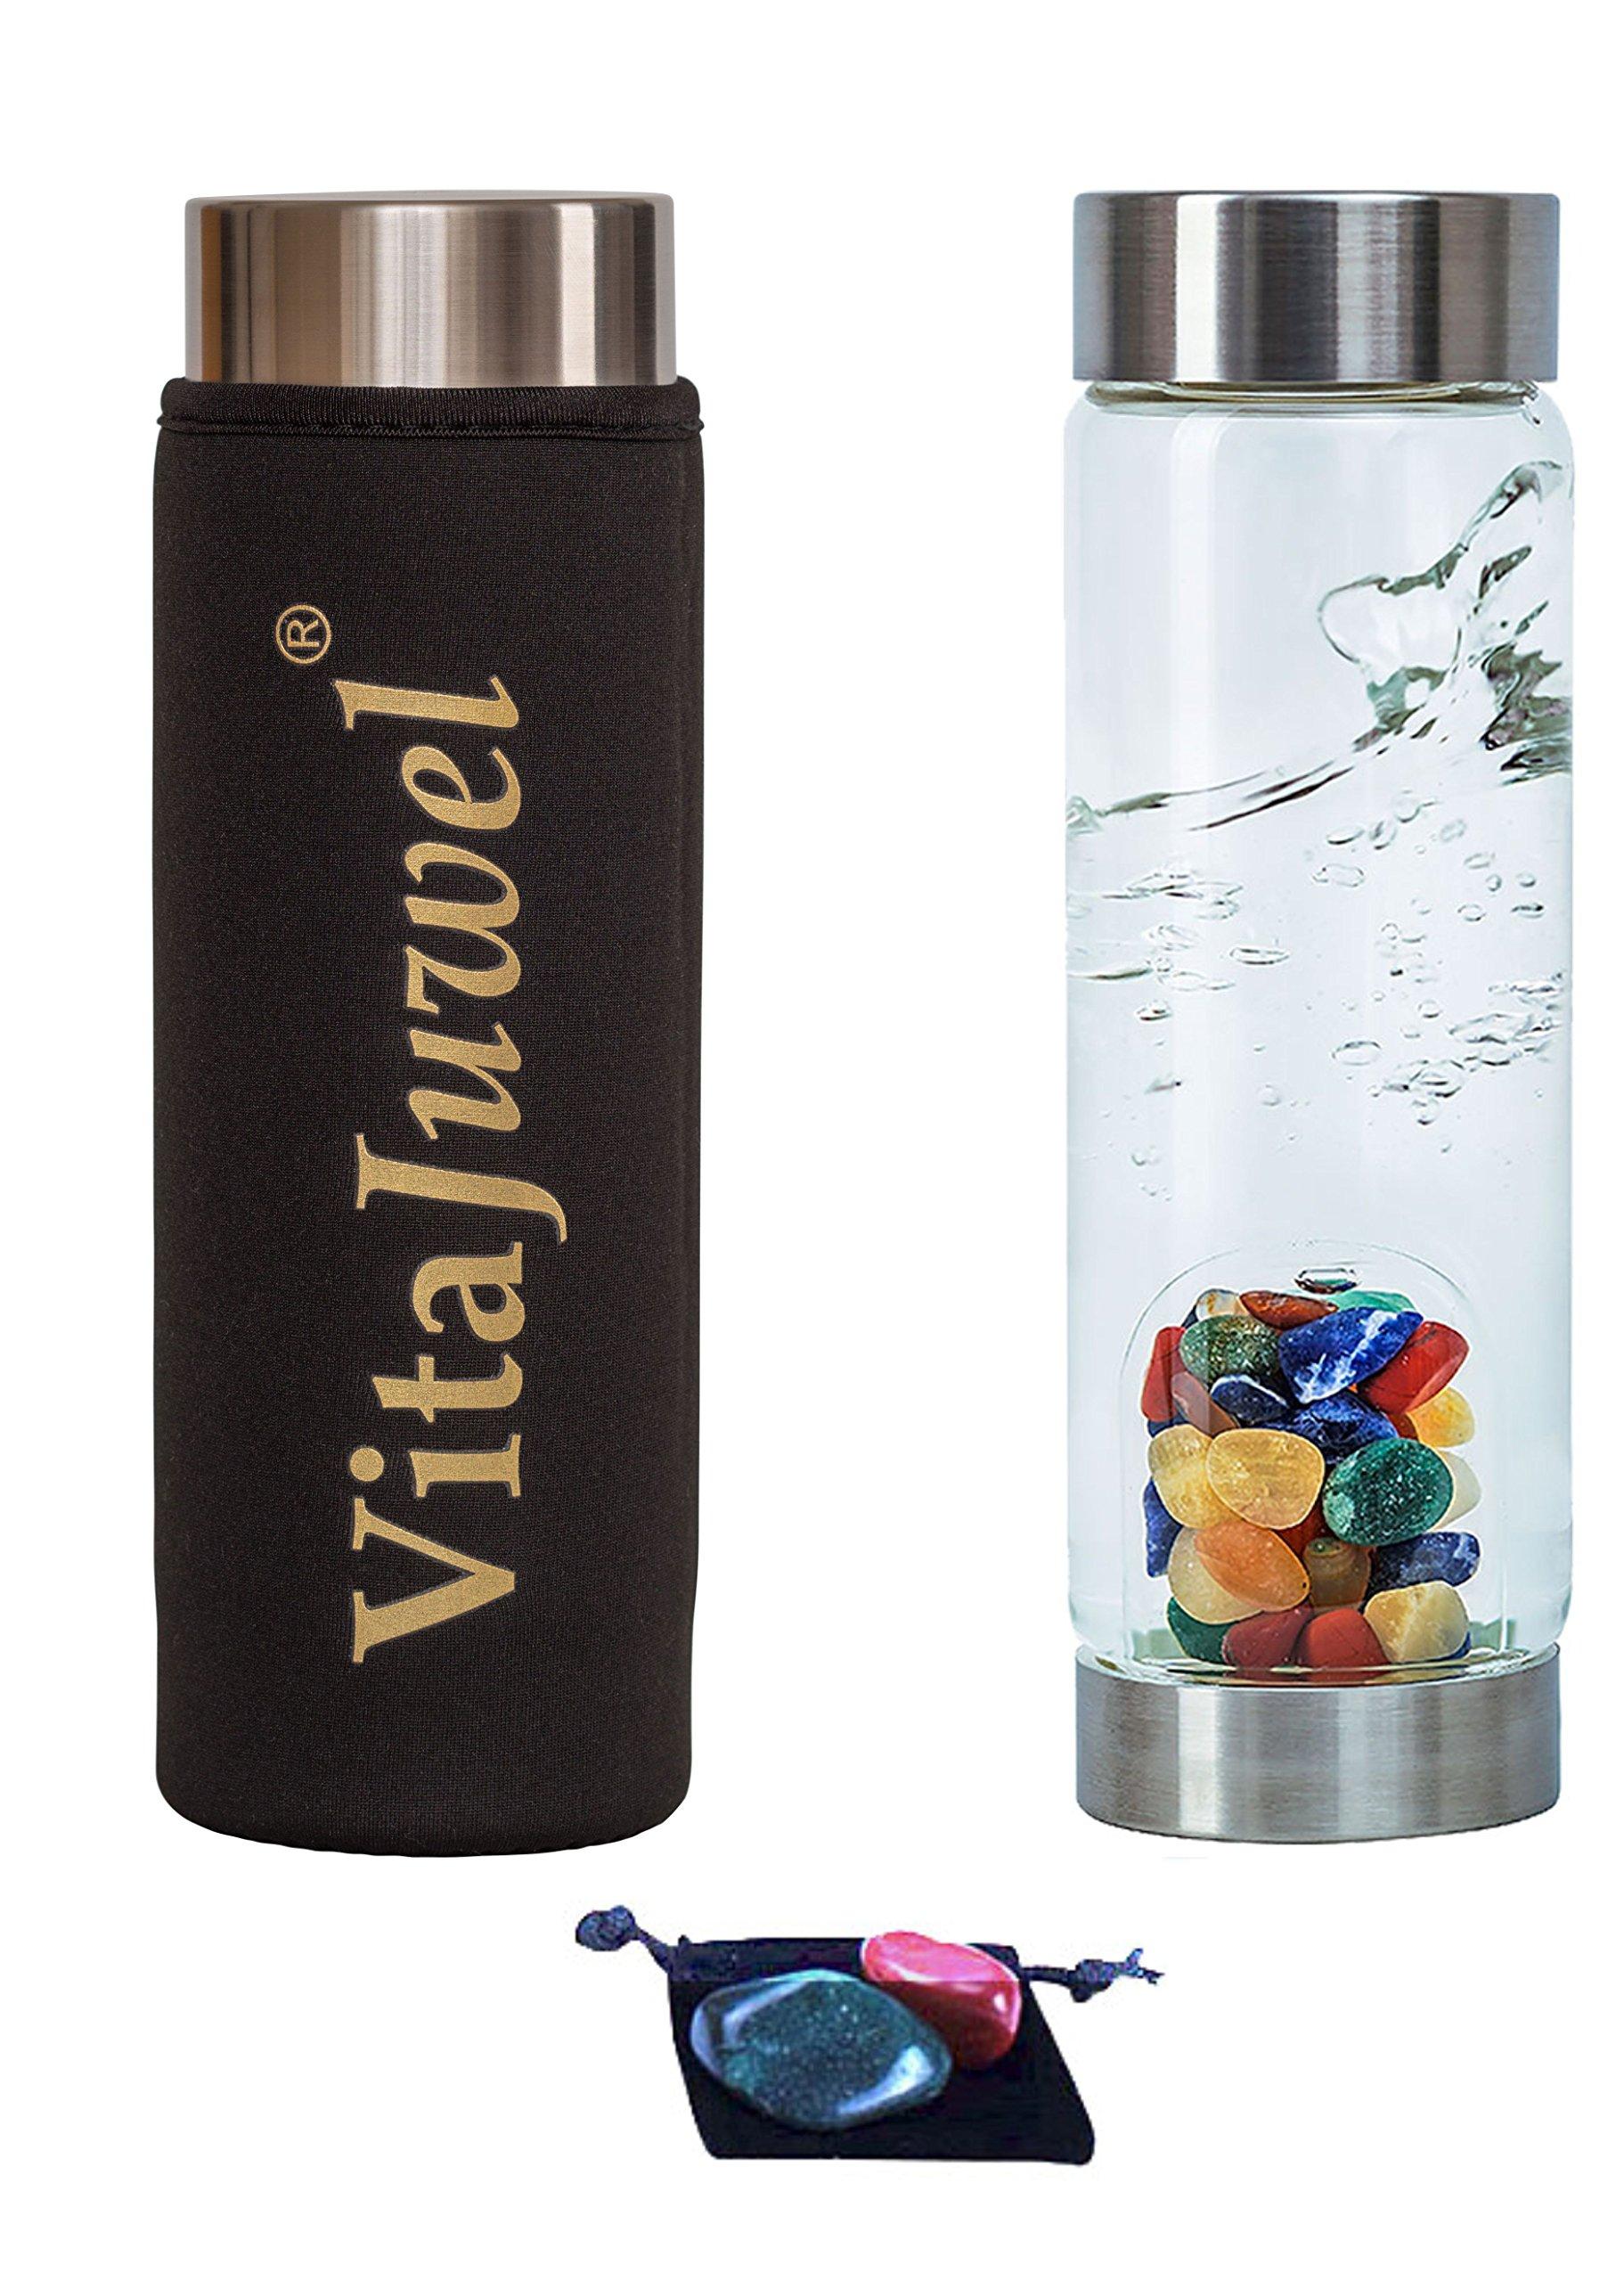 Kids VitaJuwel ViA Gemwater Bottle with Neoprene Sleeve, 2 Worry Stones and Velvet Pouch (5 Piece Bundle) Imprints Plus (02209)…